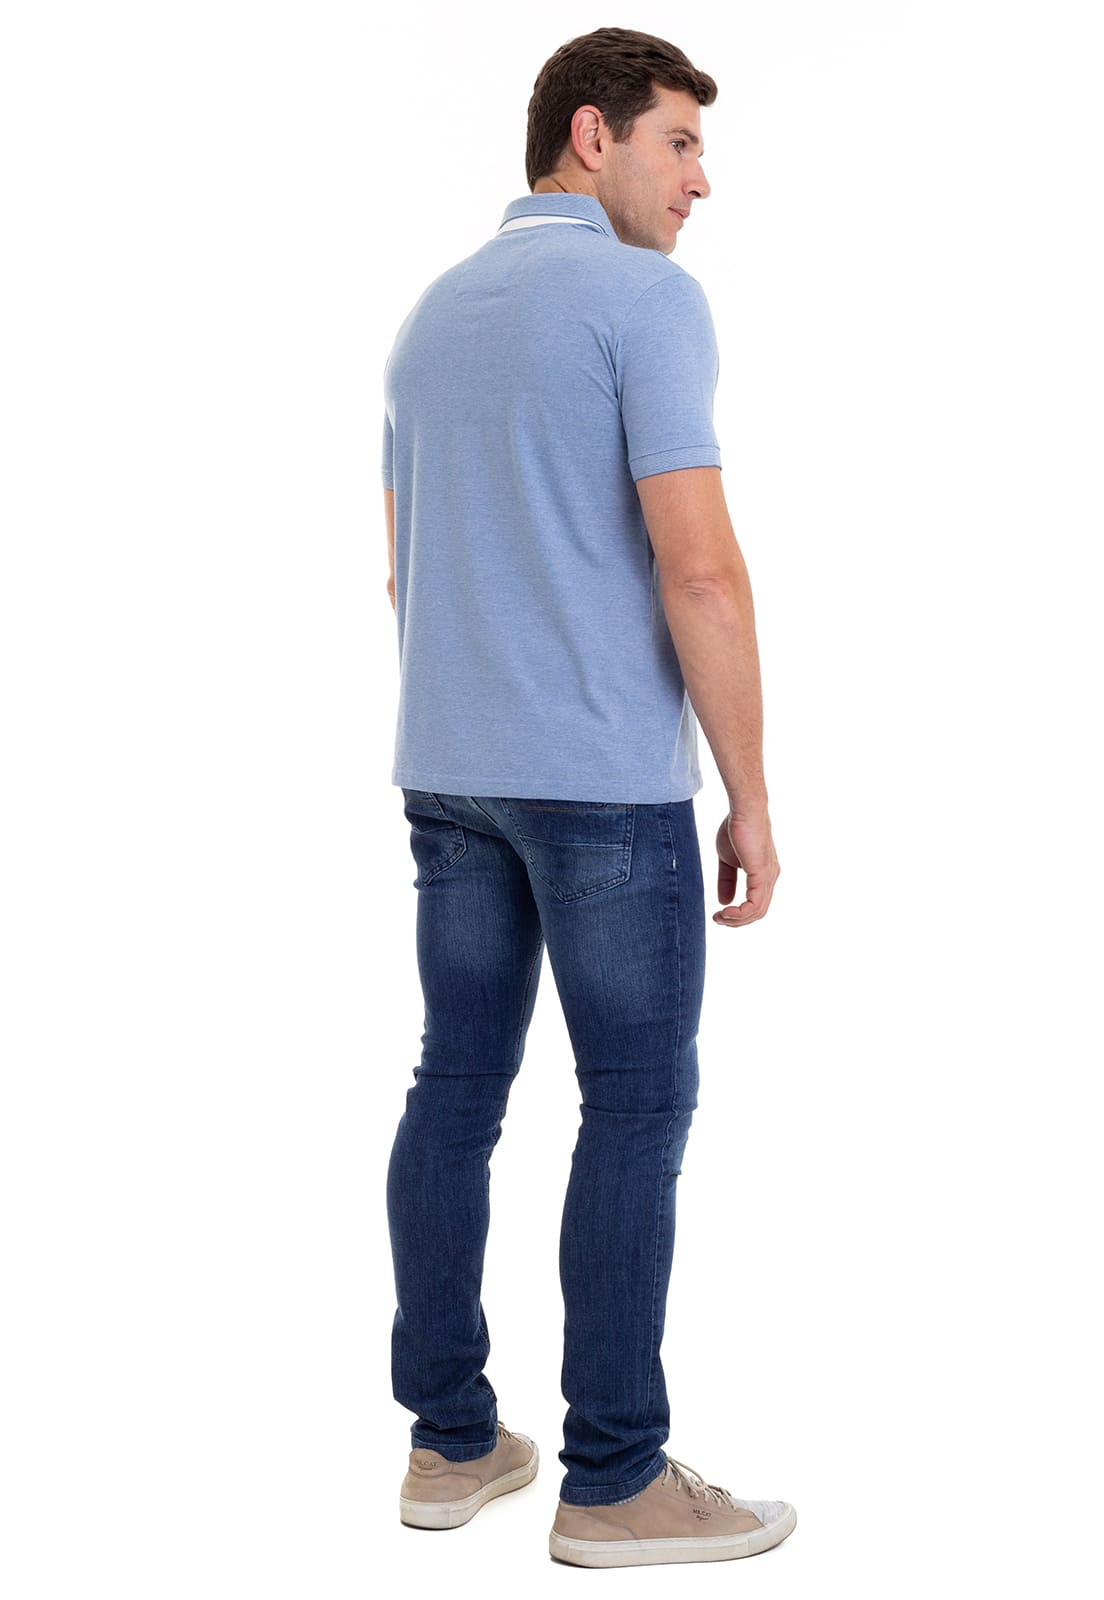 Camisa Polo Masculina Hifen